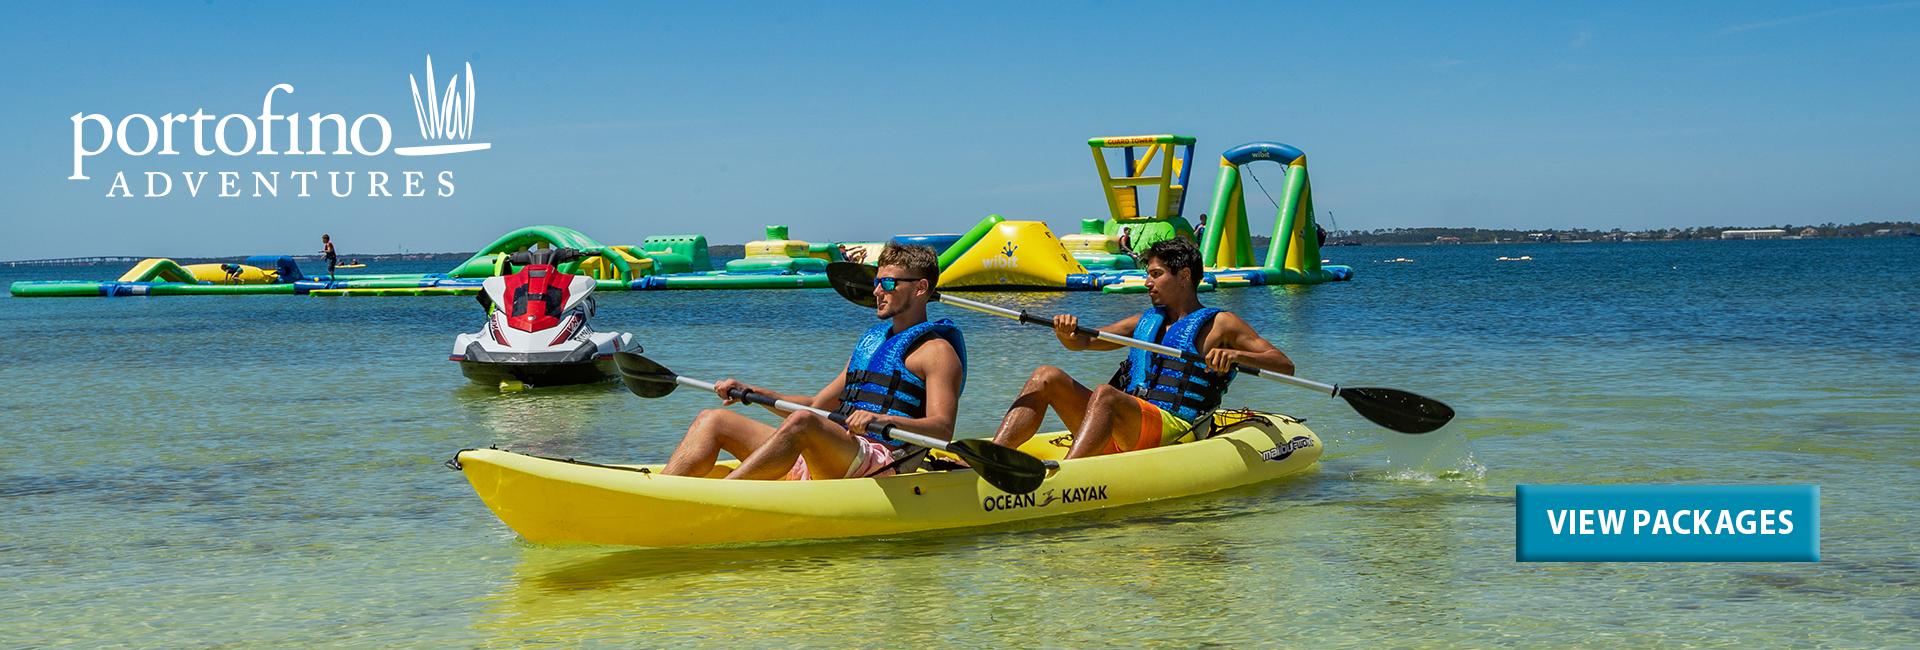 Adventures at Portofino - jet ski, kayak, waterpark